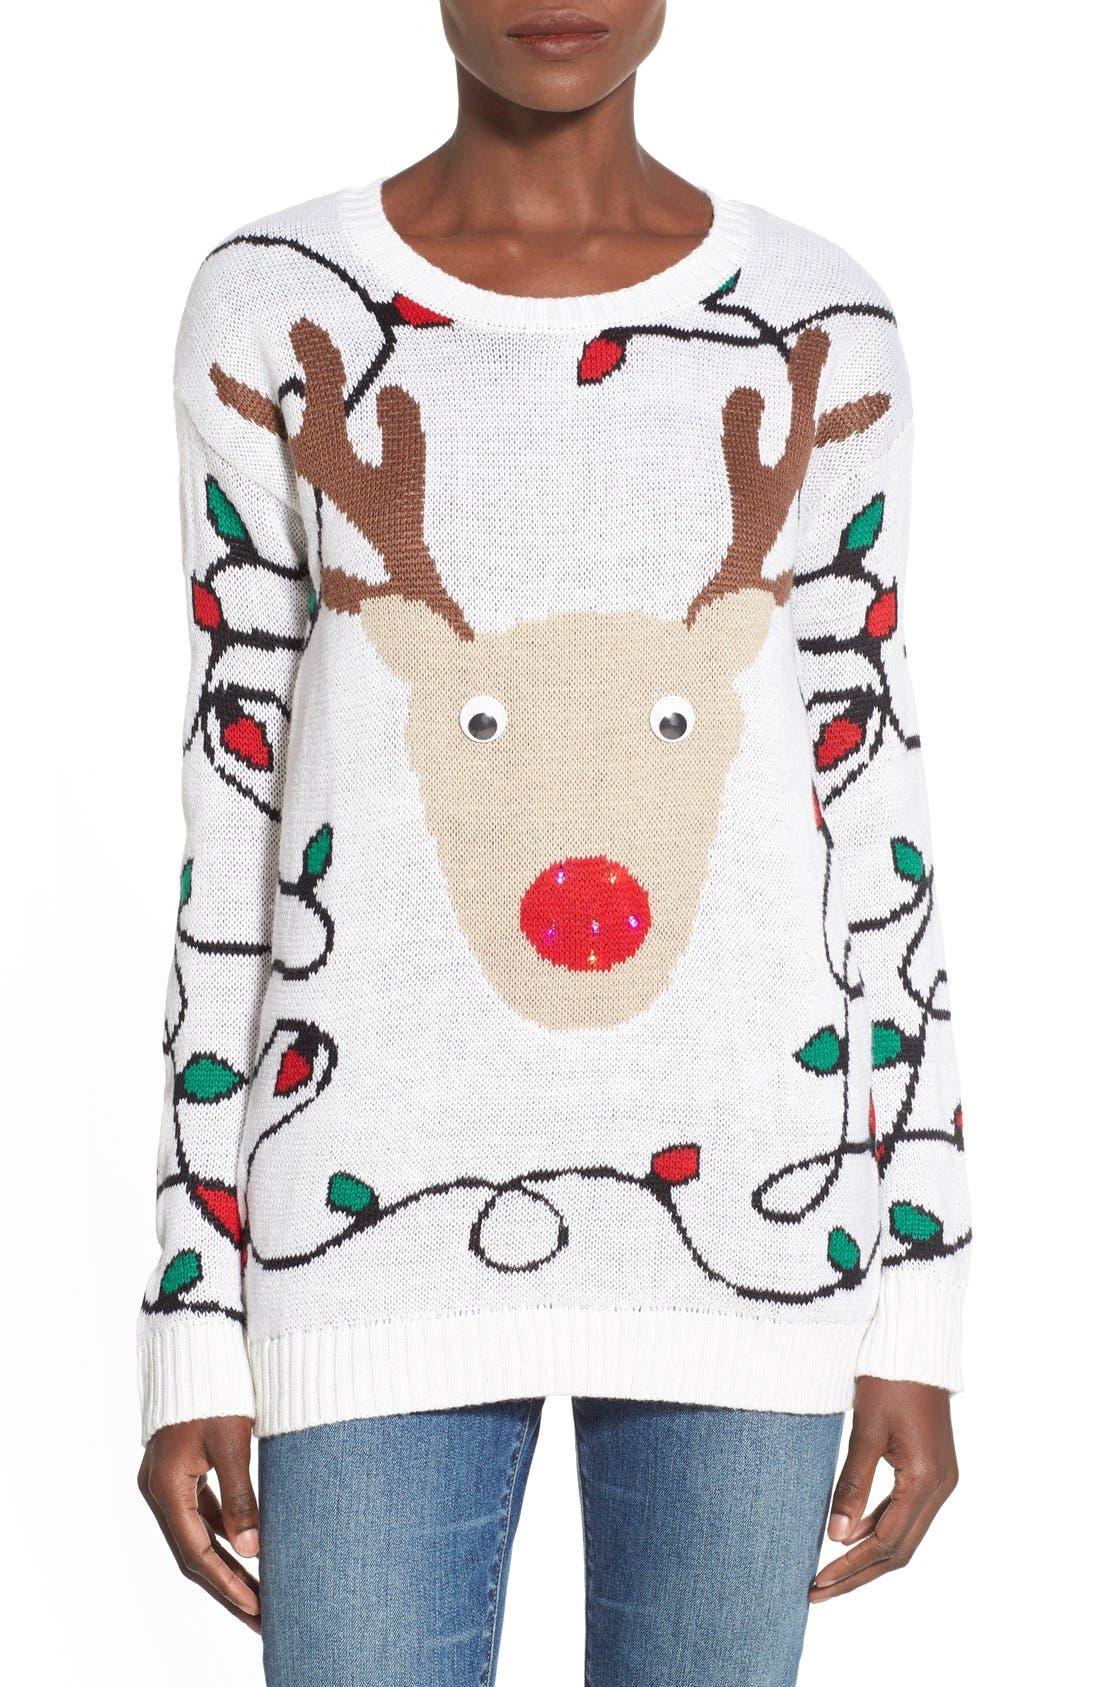 Main Image - Derek Heart Light-Up Reindeer Jacquard Christmas Sweater